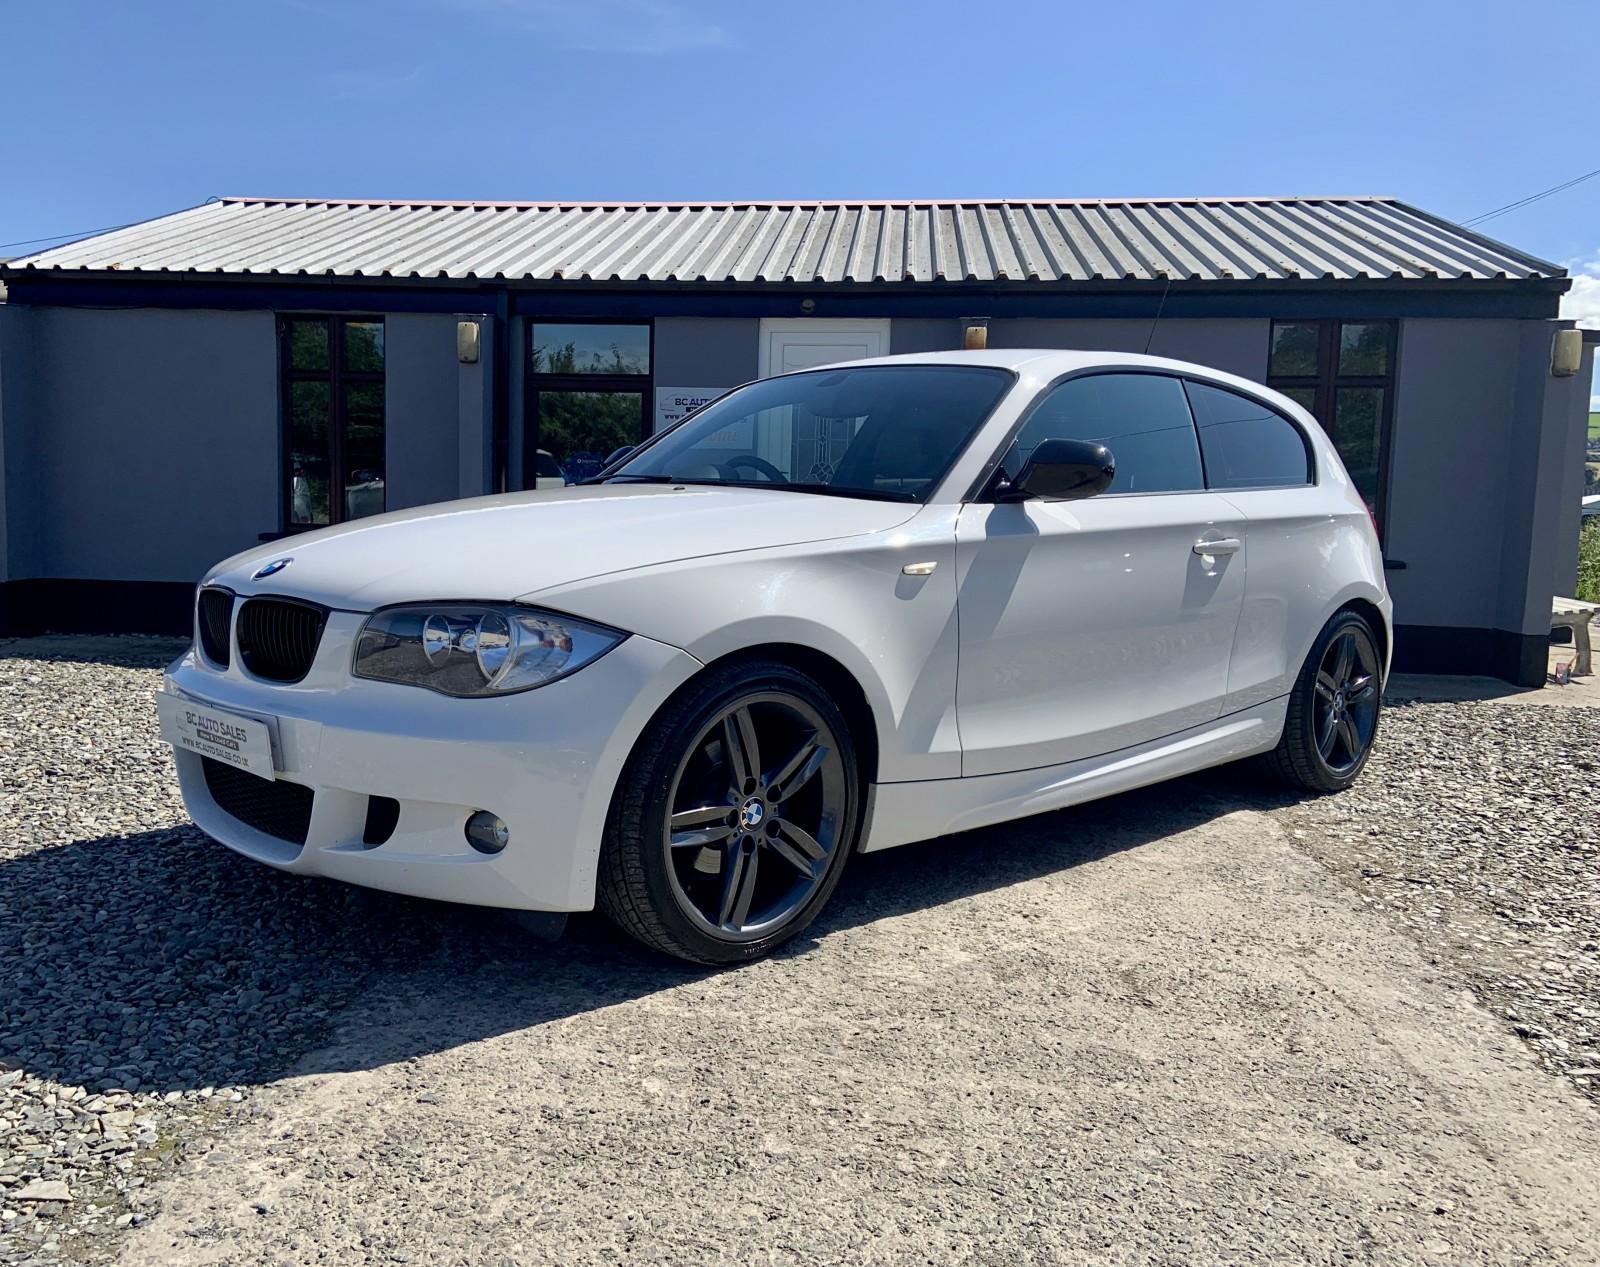 2011 BMW 1 Series 116I M SPORT Petrol Manual – BC Autosales 17A Airfield Road, Eglinton, Londonderry BT47 3PZ, UK full